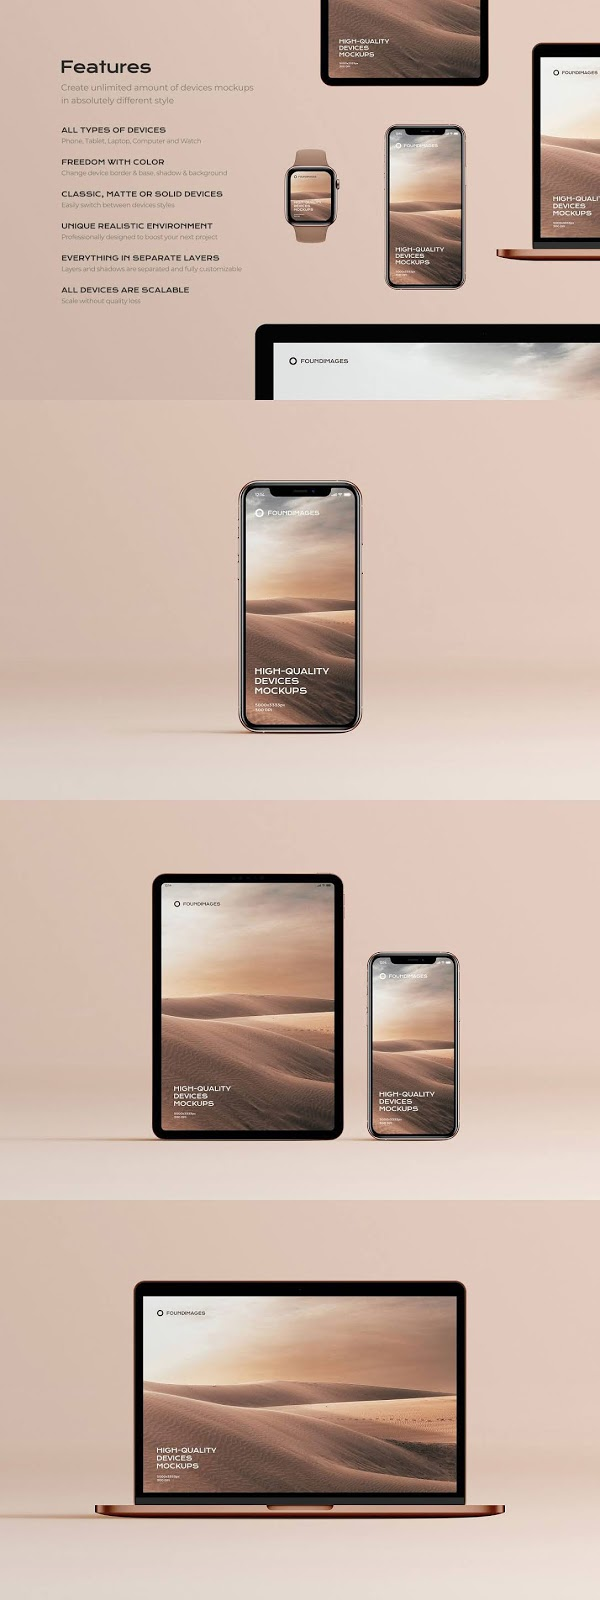 Device Scene Creator Bundle Phone Free